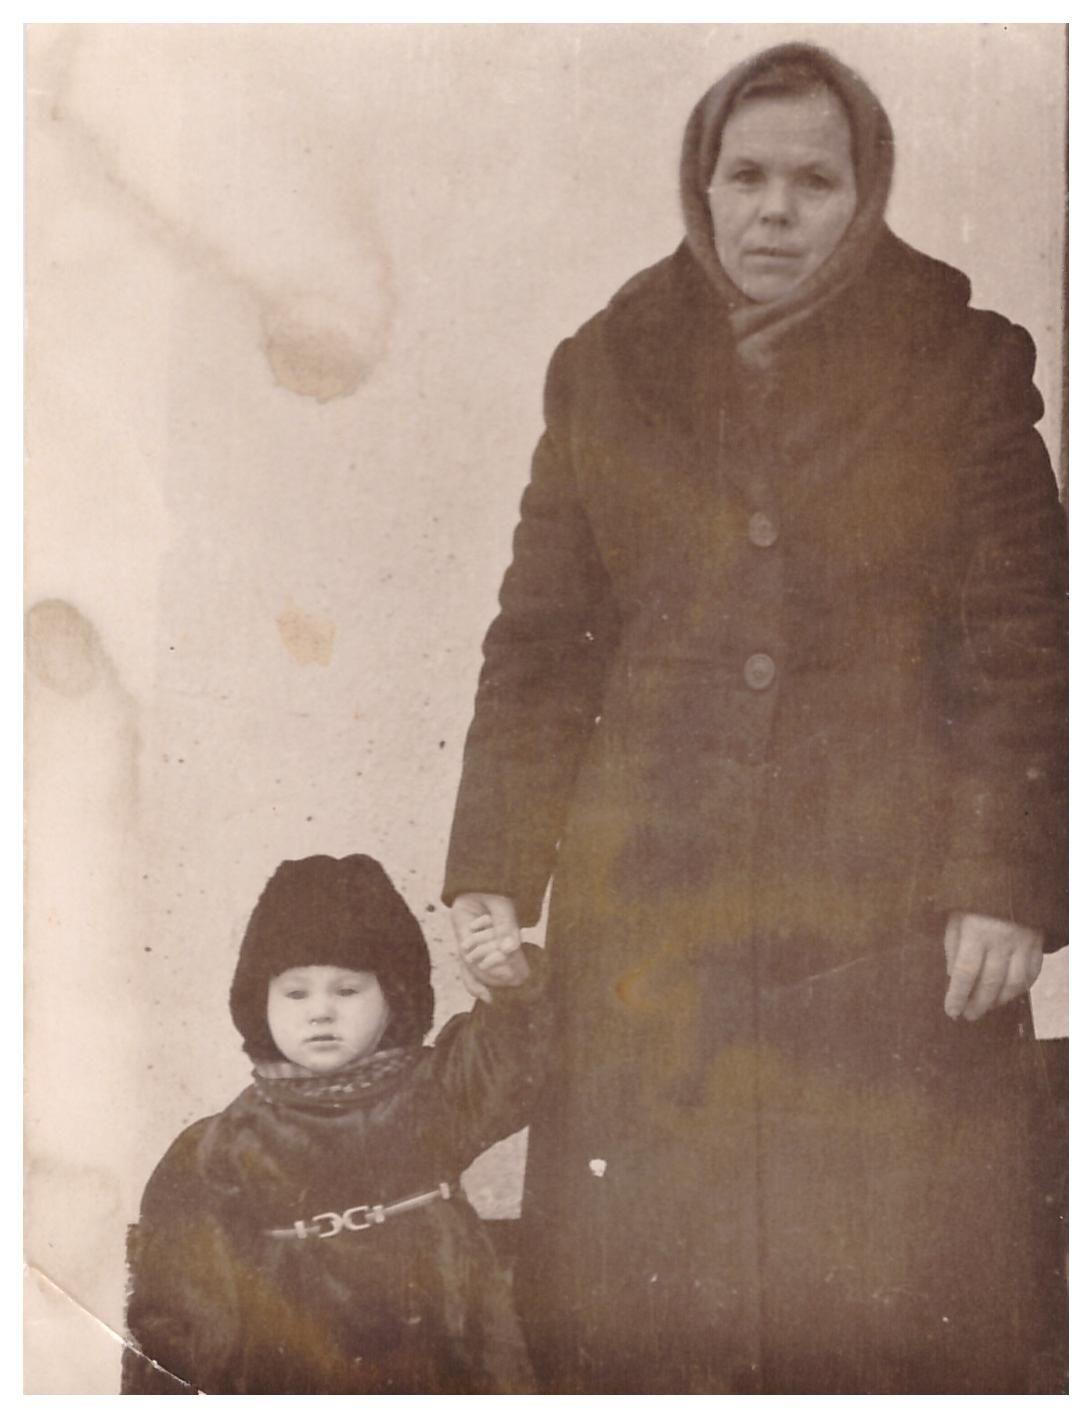 Фото Миненко В.А. и его бабушки.jpg